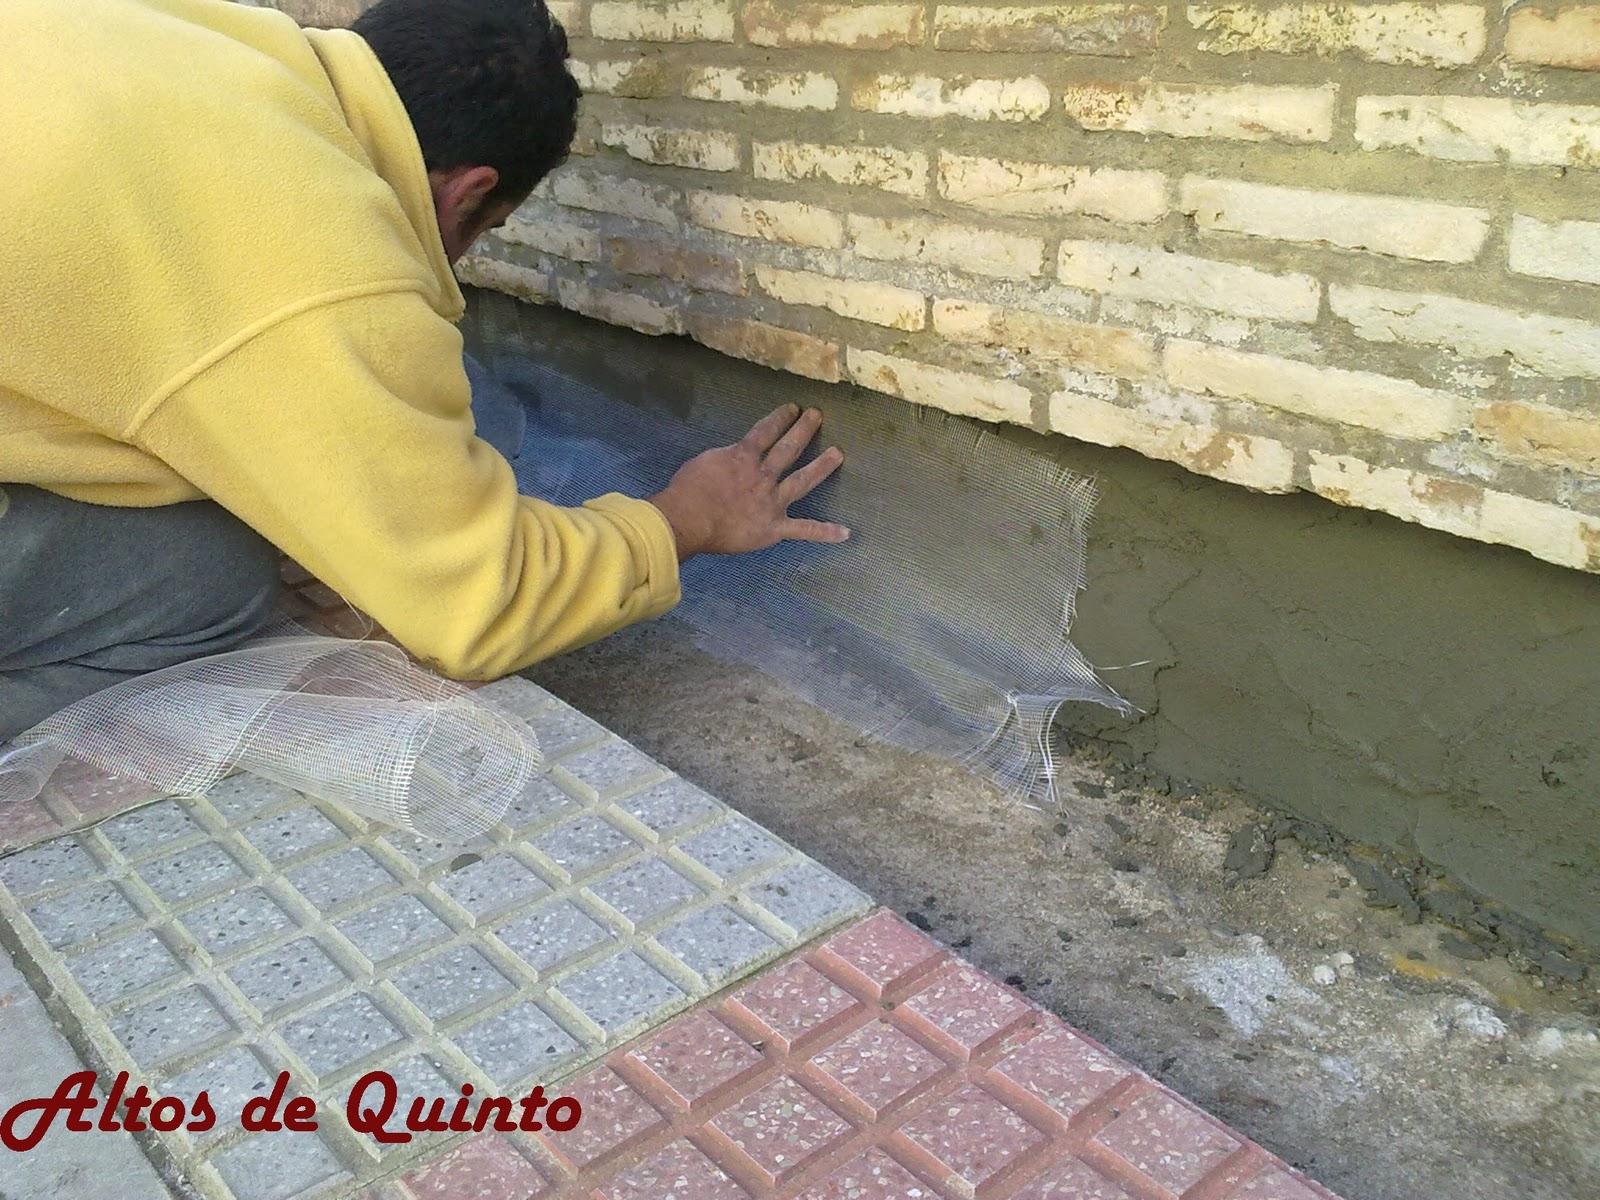 Altos de quinto arreglo de humedades en z calo de fachada - Zocalos de fachadas ...